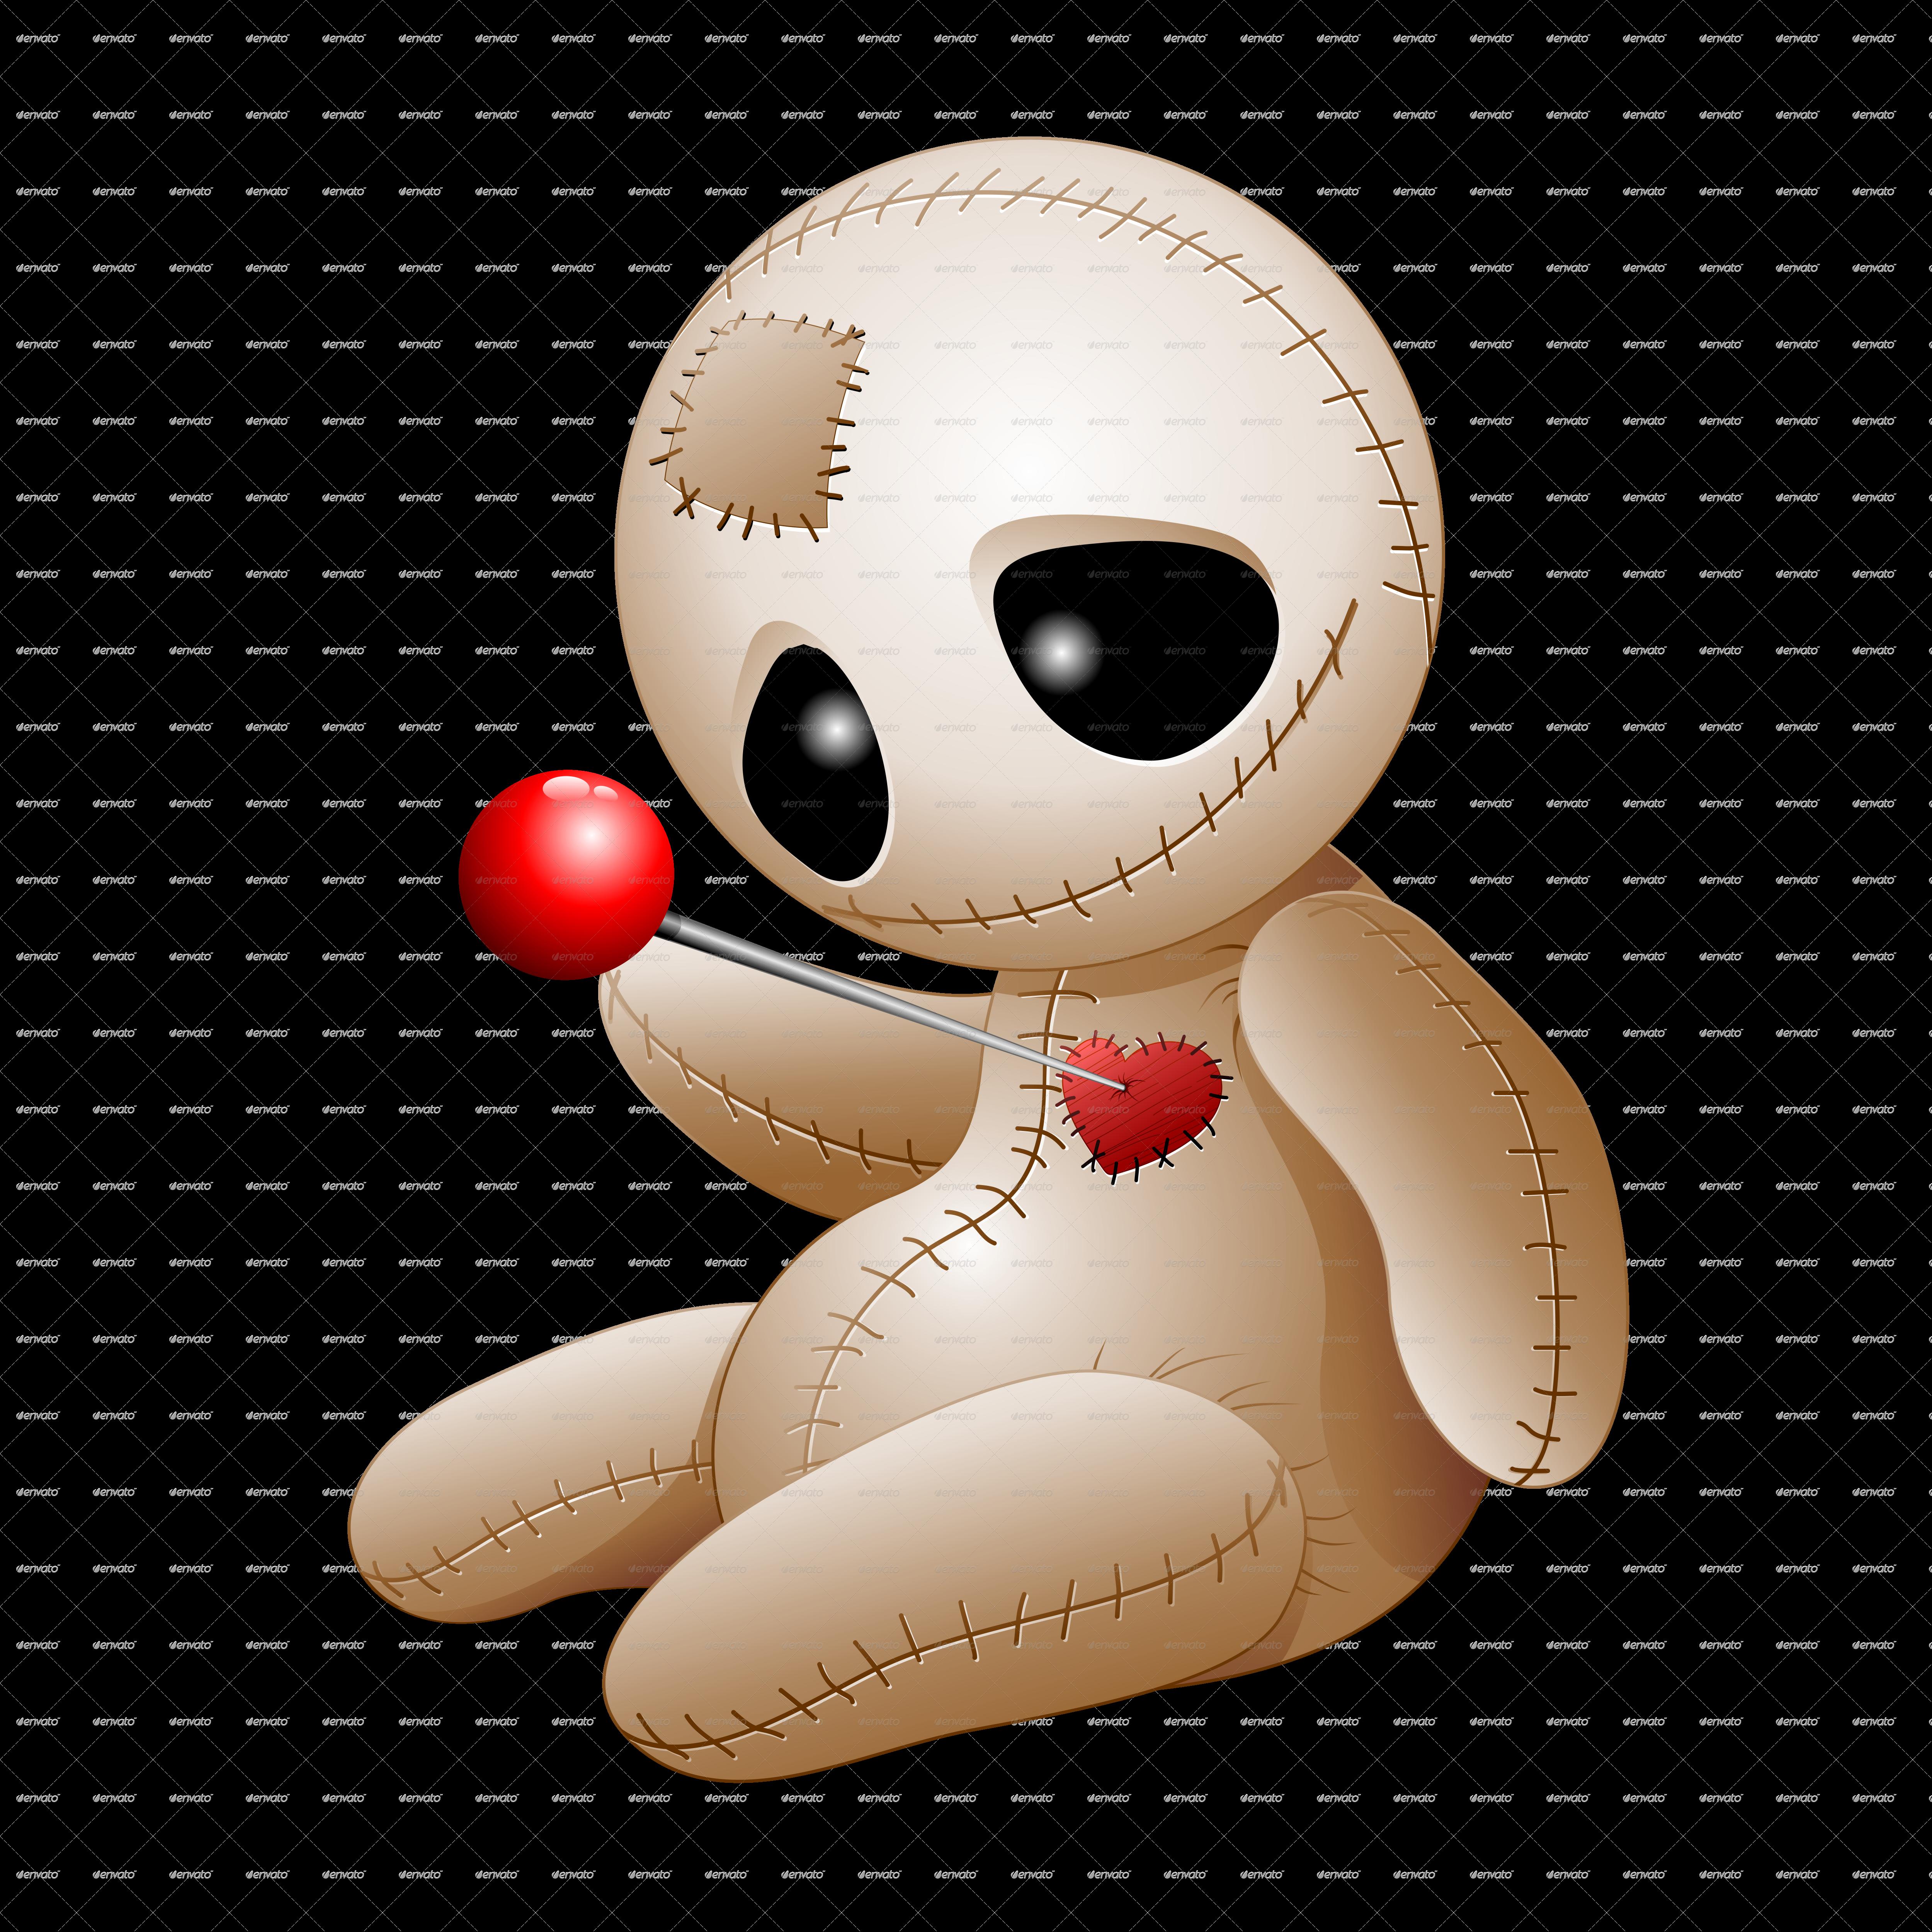 Voodoo Doll Cartoon In Love Voodoo Dolls Dolls Voodoo